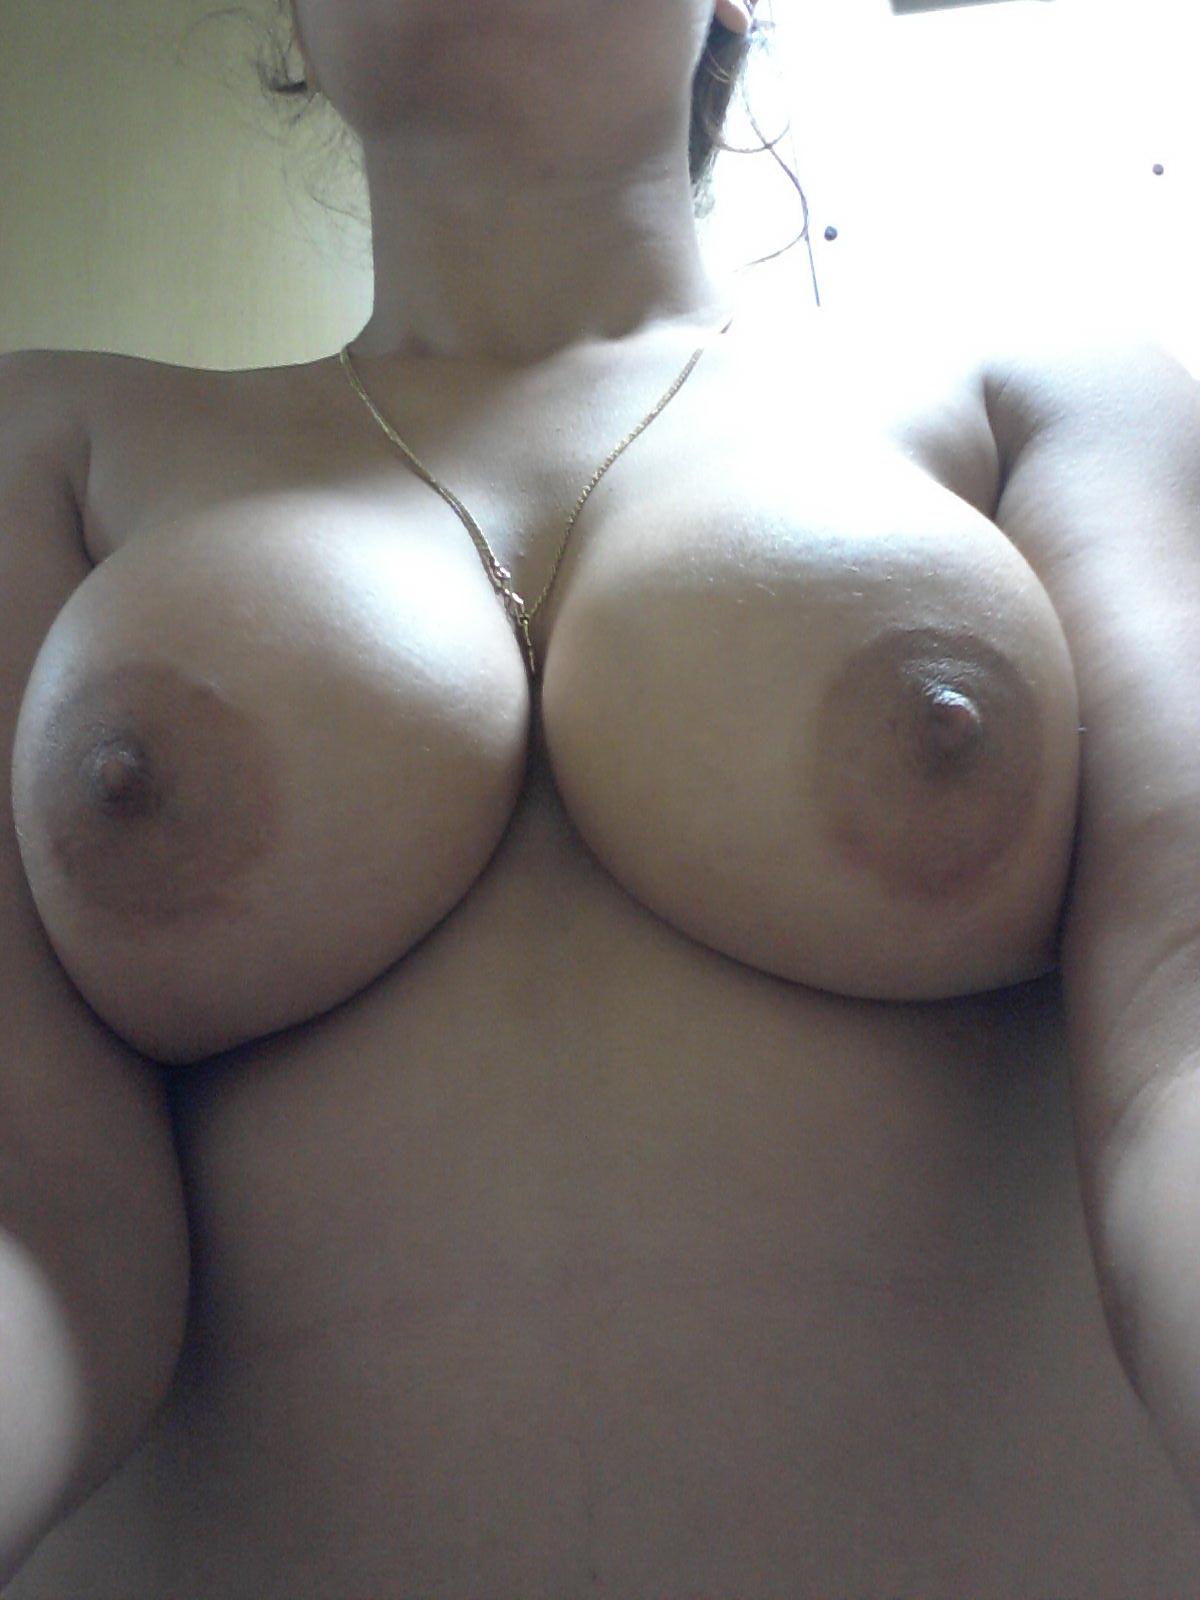 Indian big boob muslim girls nude gallery